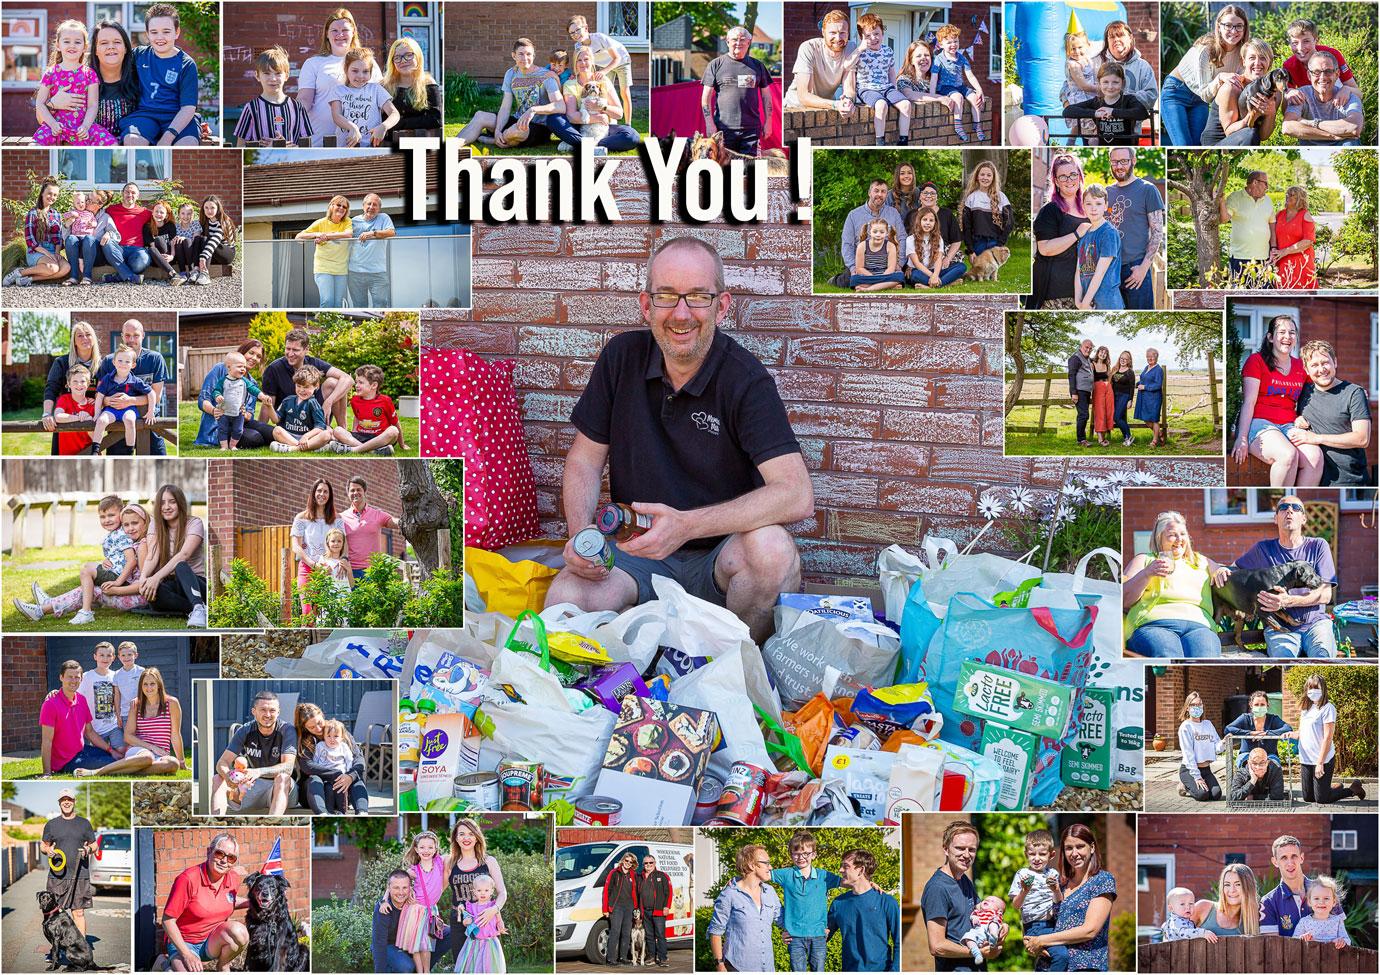 Examples of Jon and Jon's doorstep photos and foodbank donations.